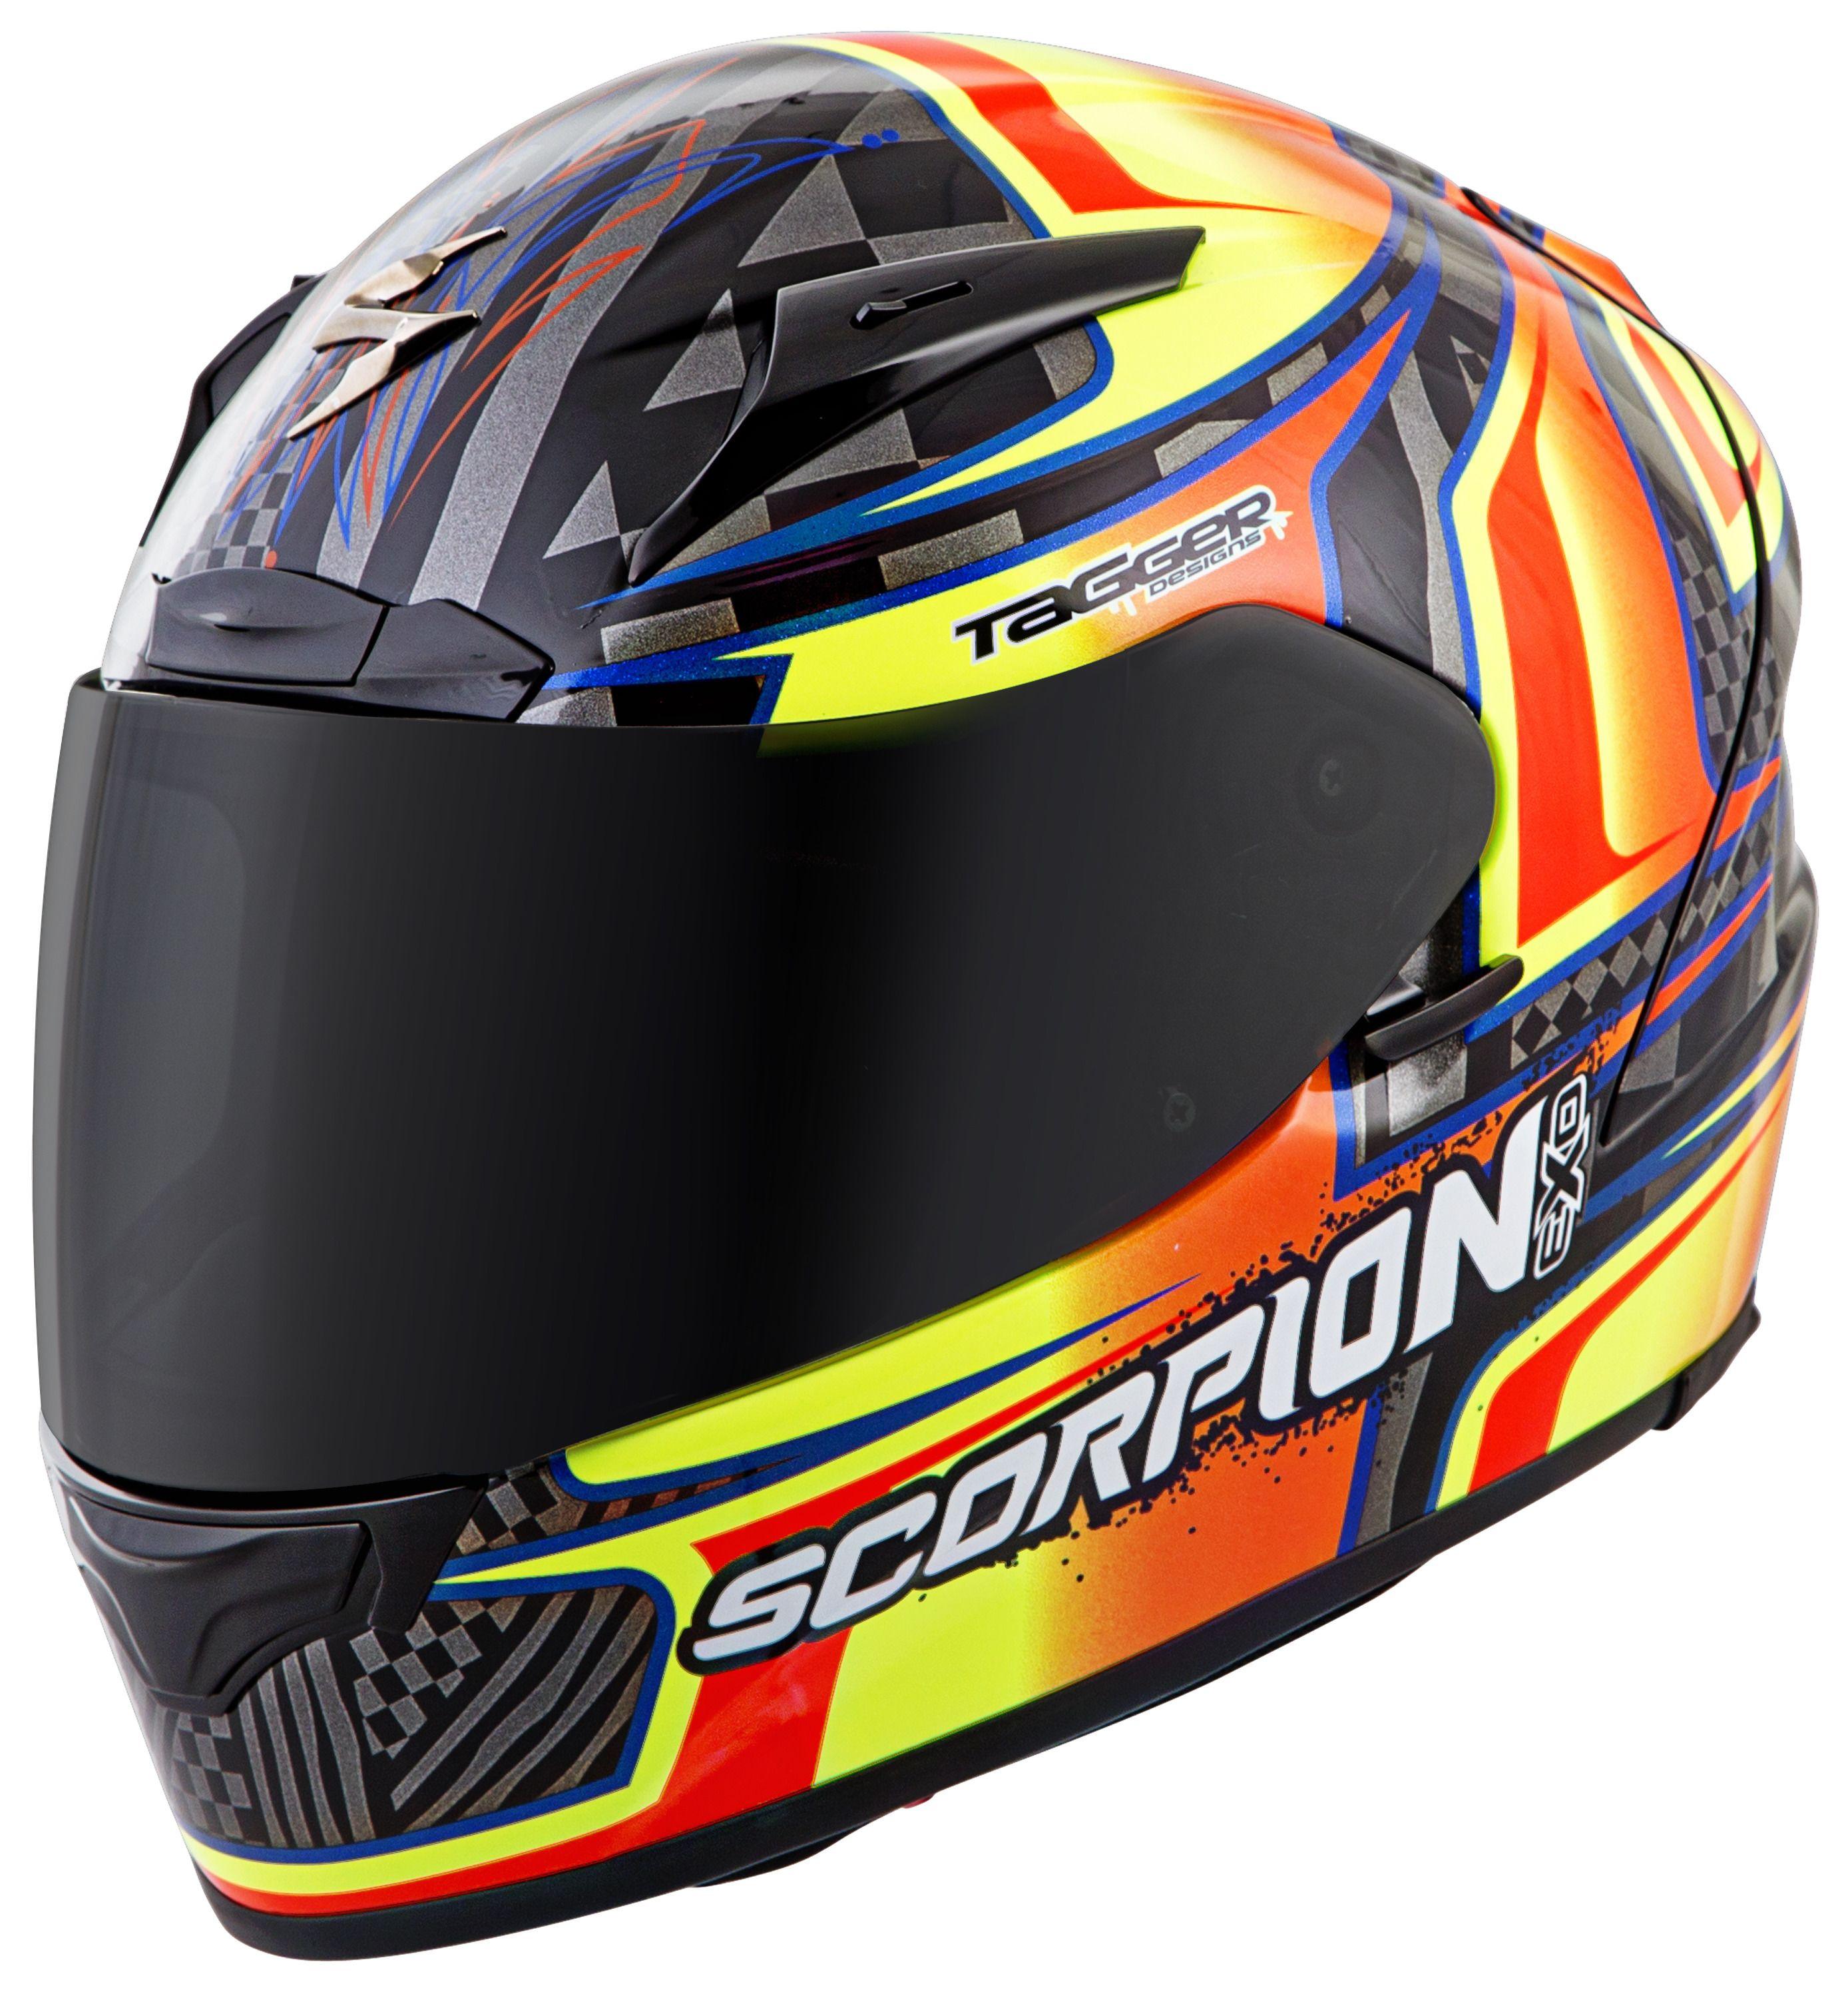 Icon Airmada Seance Helmet - RevZilla